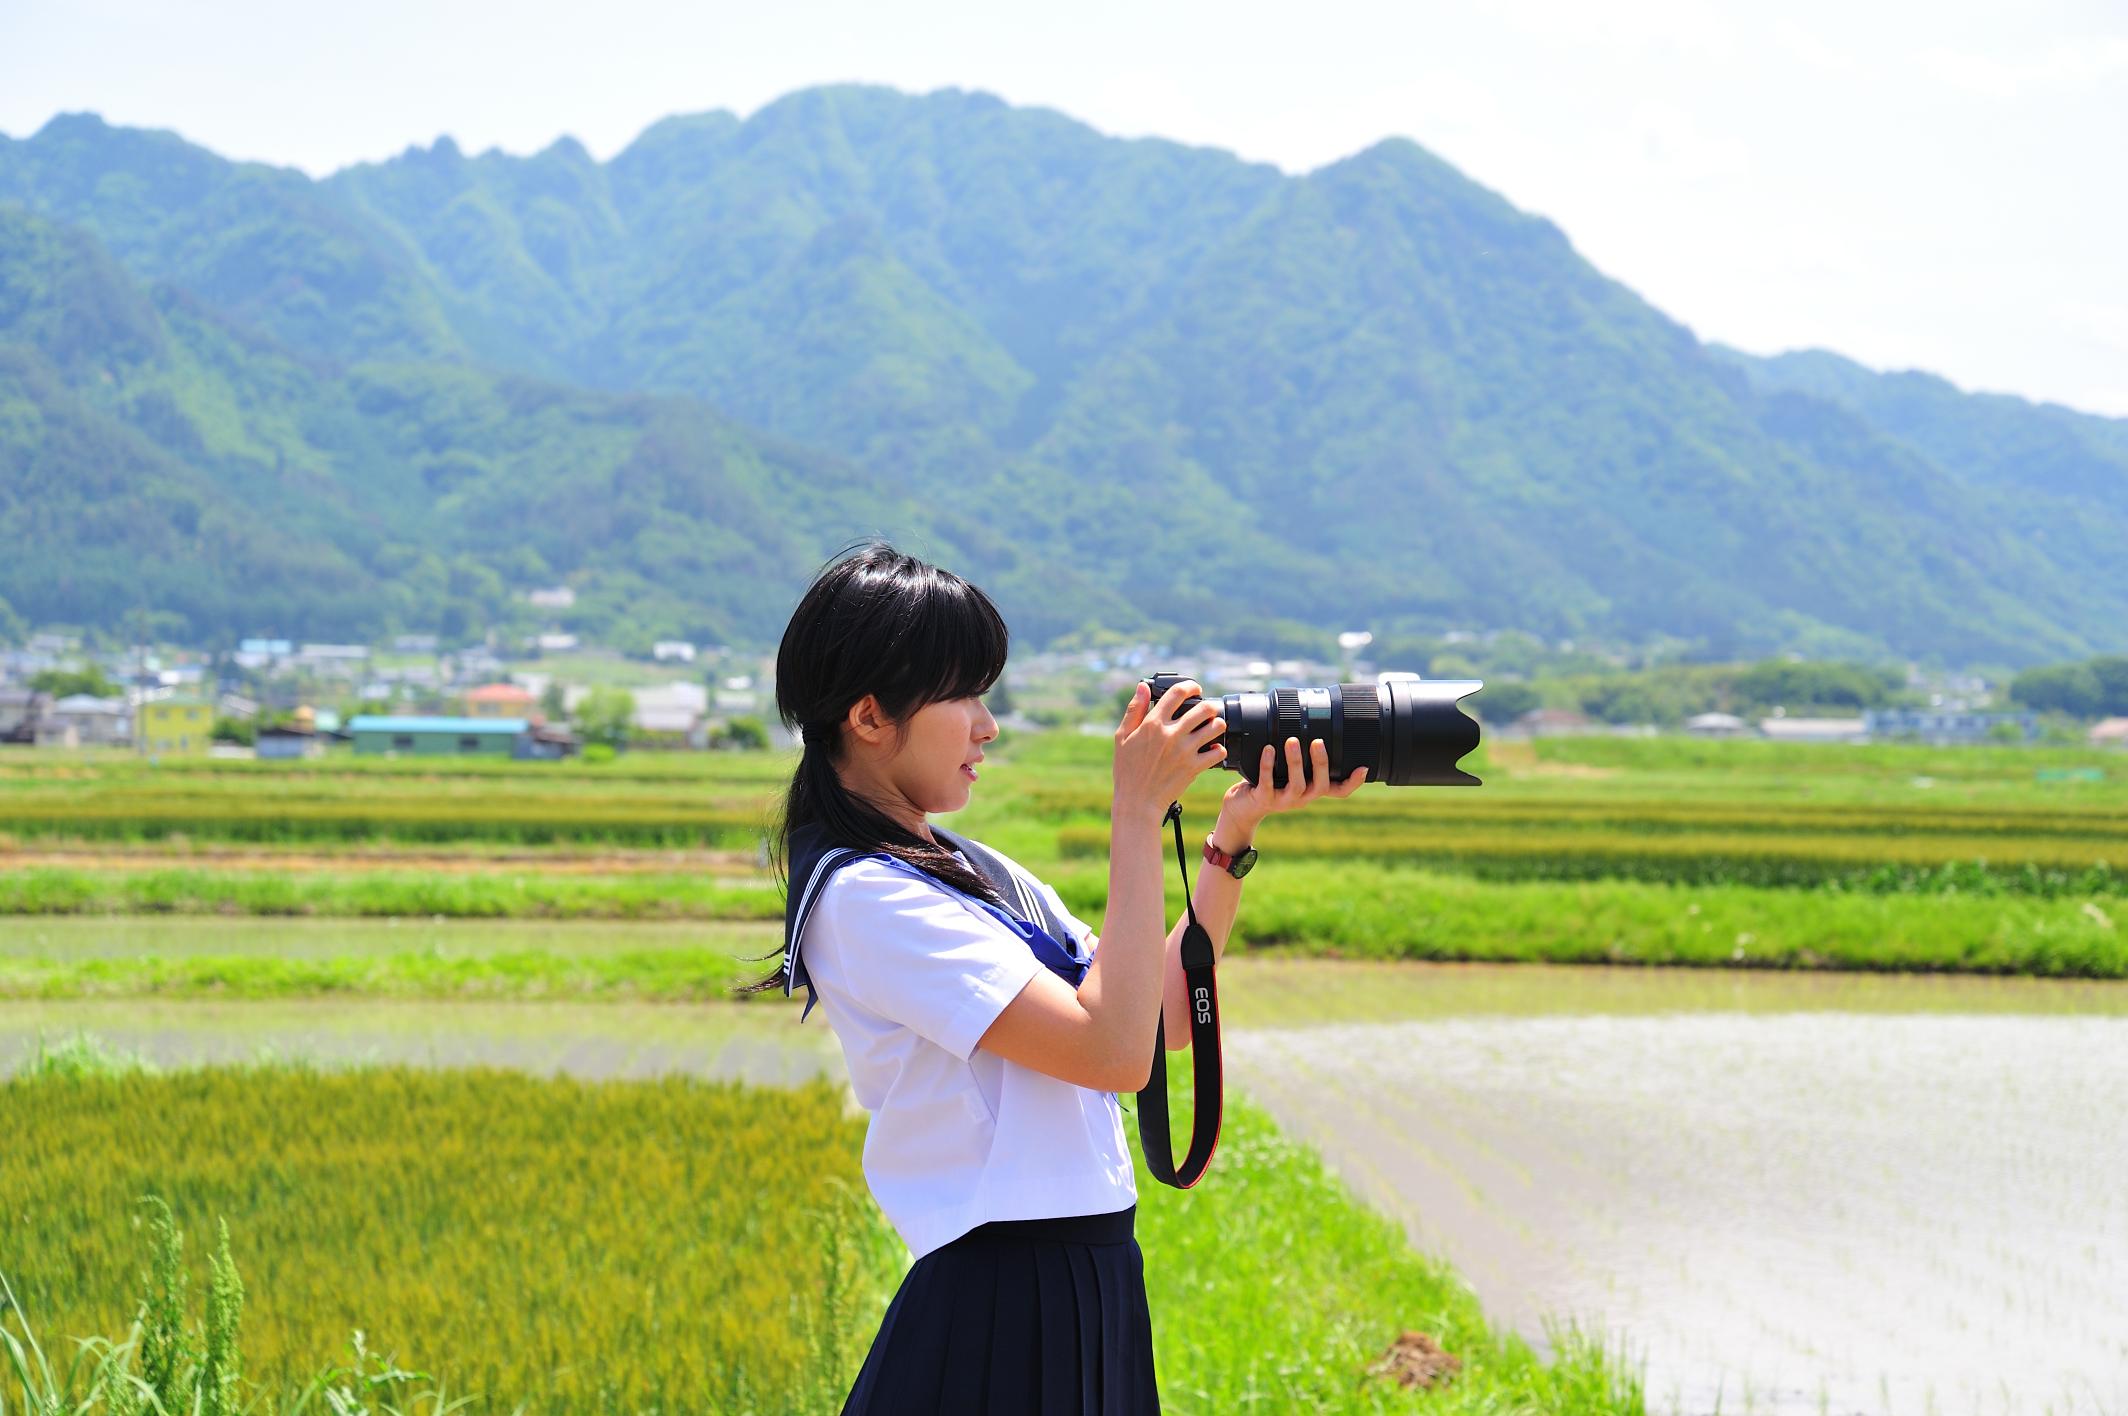 夏子 Natsuko